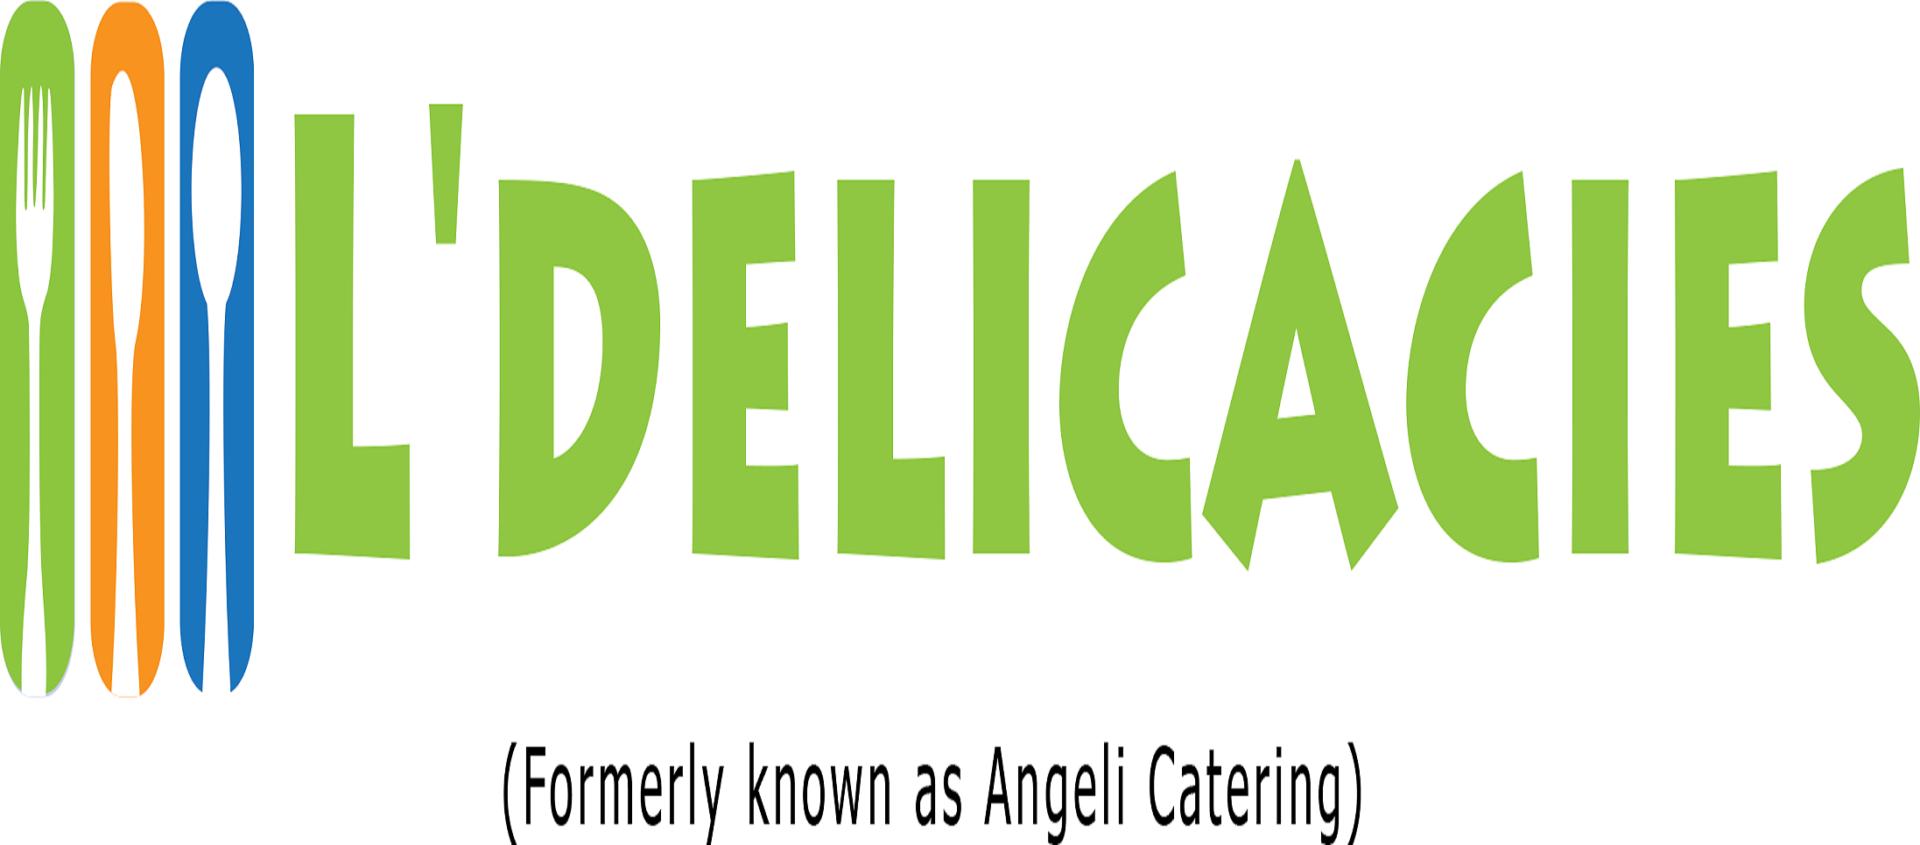 Ldelicacies Fka   Logo